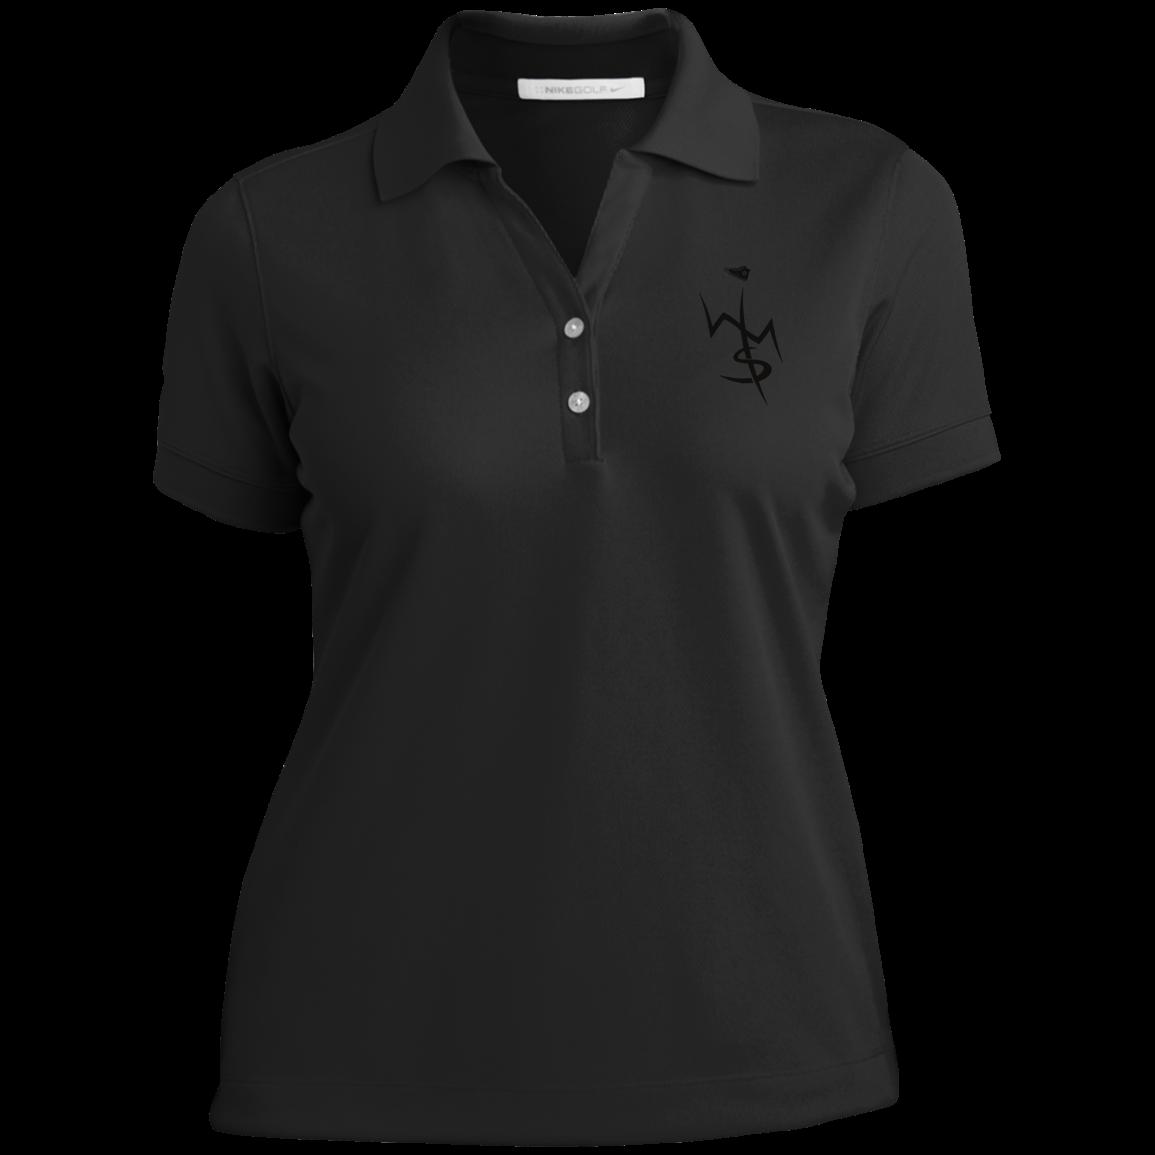 4036e36d 286772 Ladies Nike® Dri-Fit Polo Shirt | Products | Pinterest ...